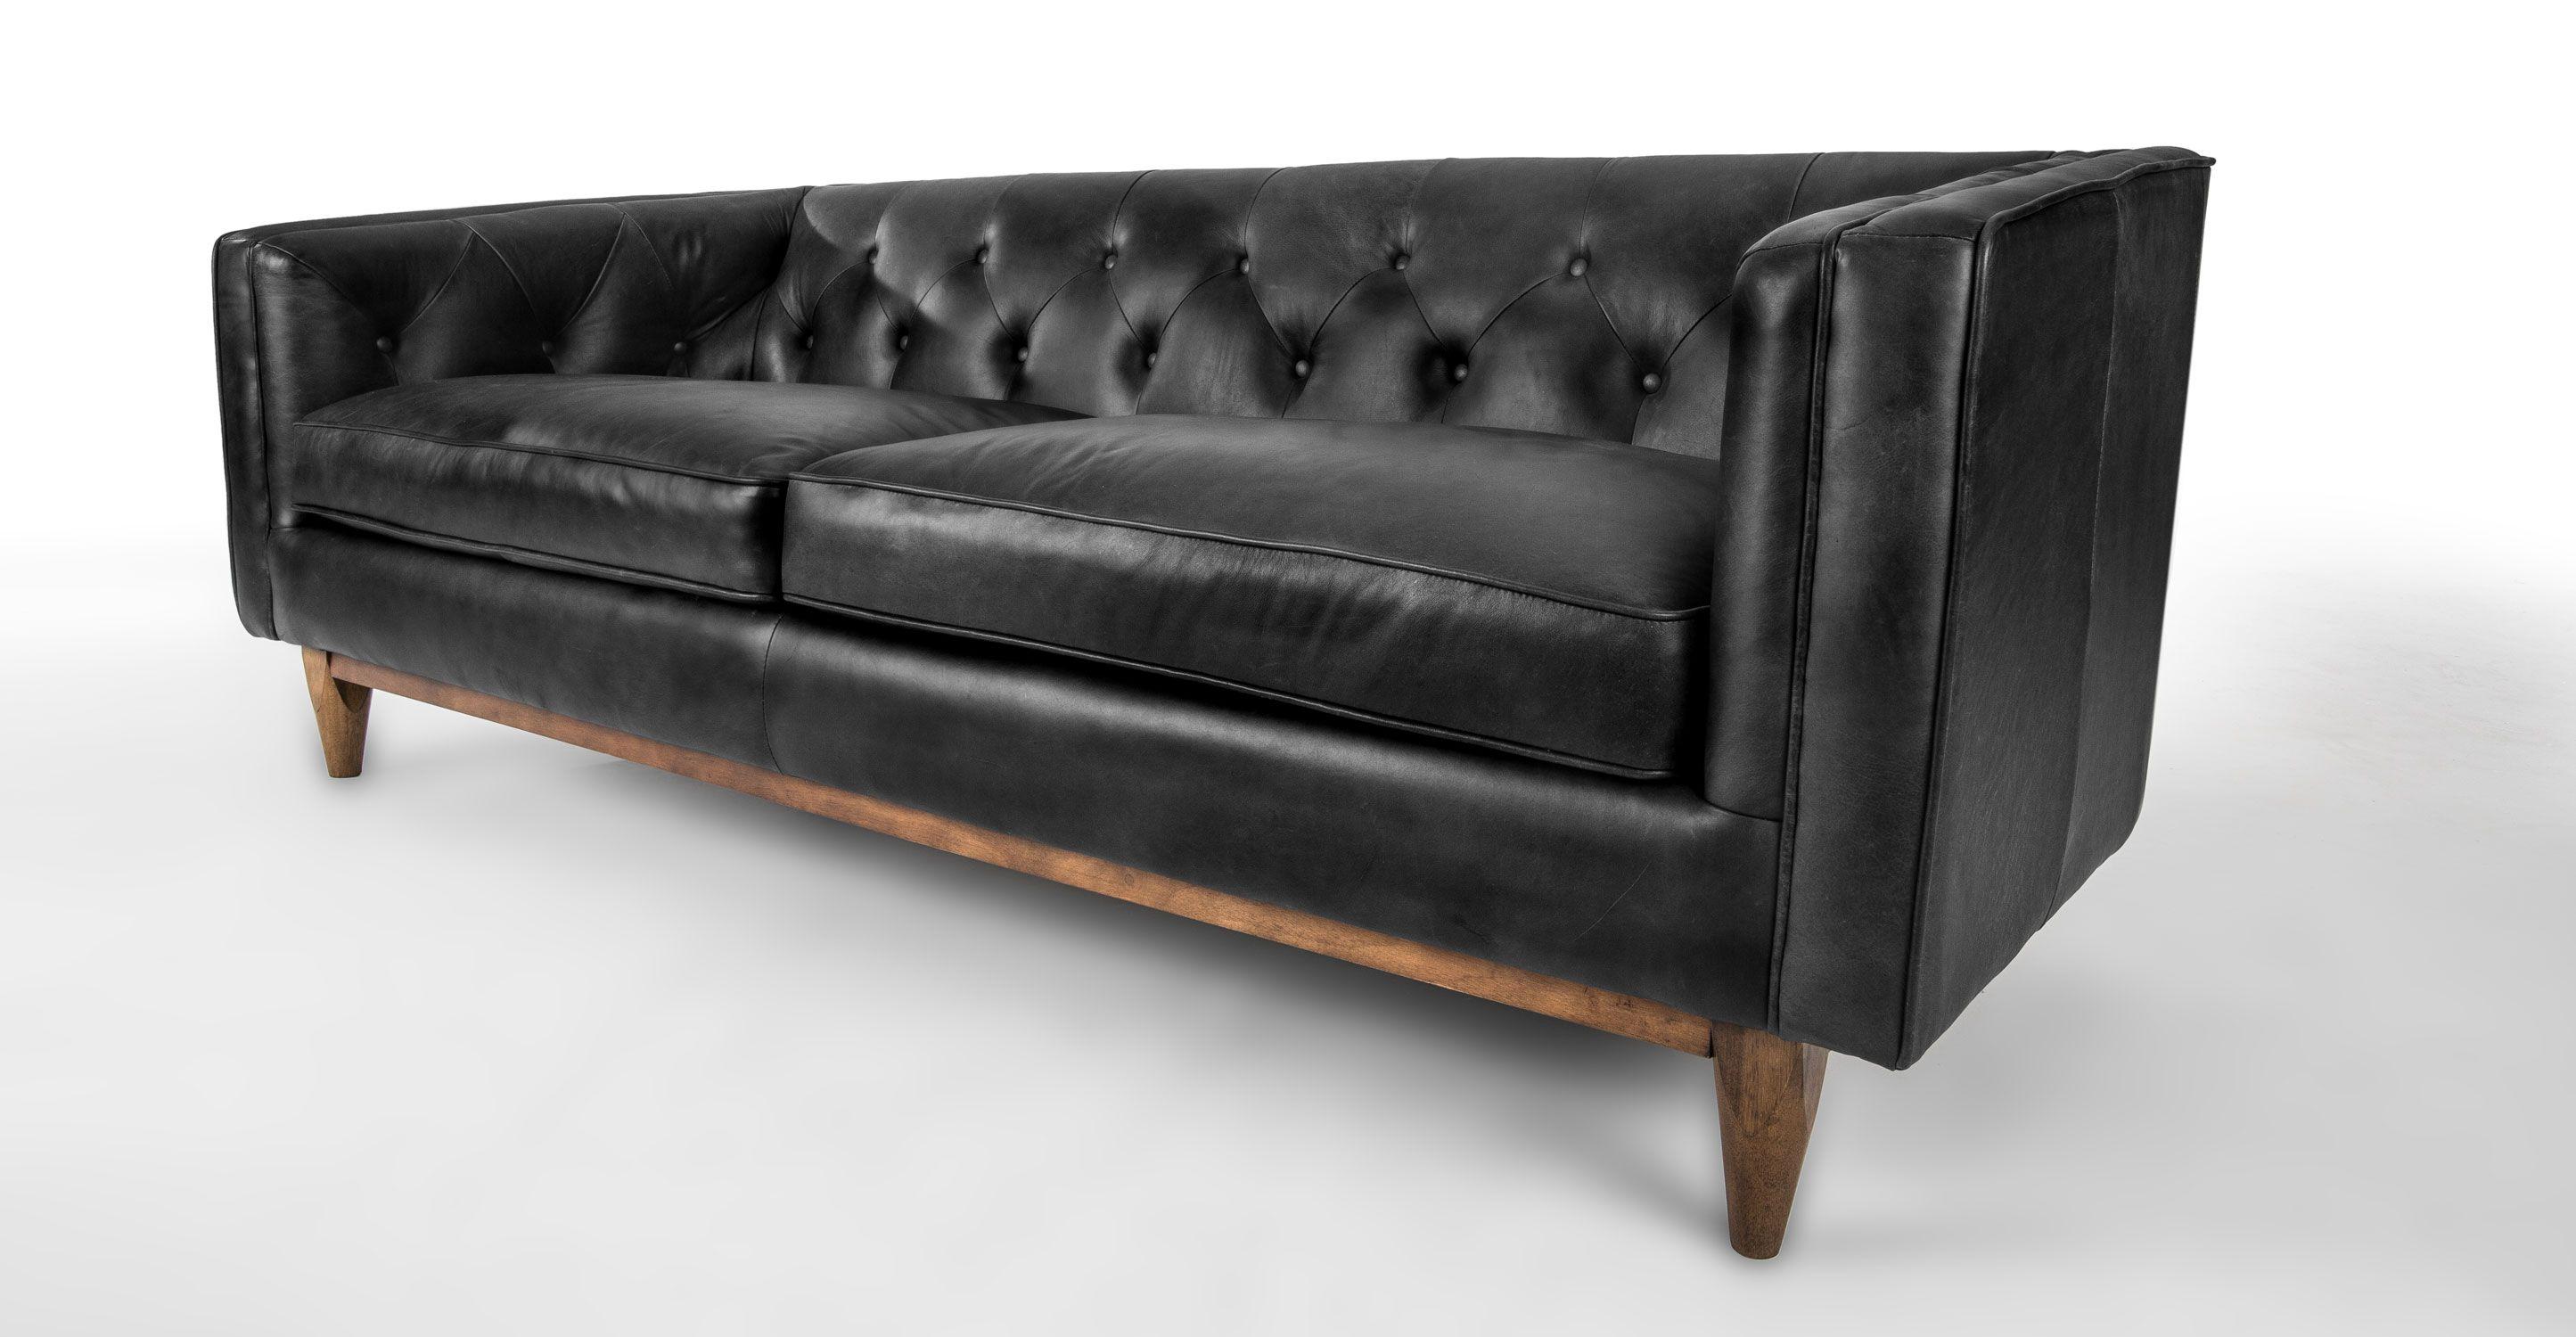 modern black leather sofa single seater malaysia in walnut wood finish article alcott